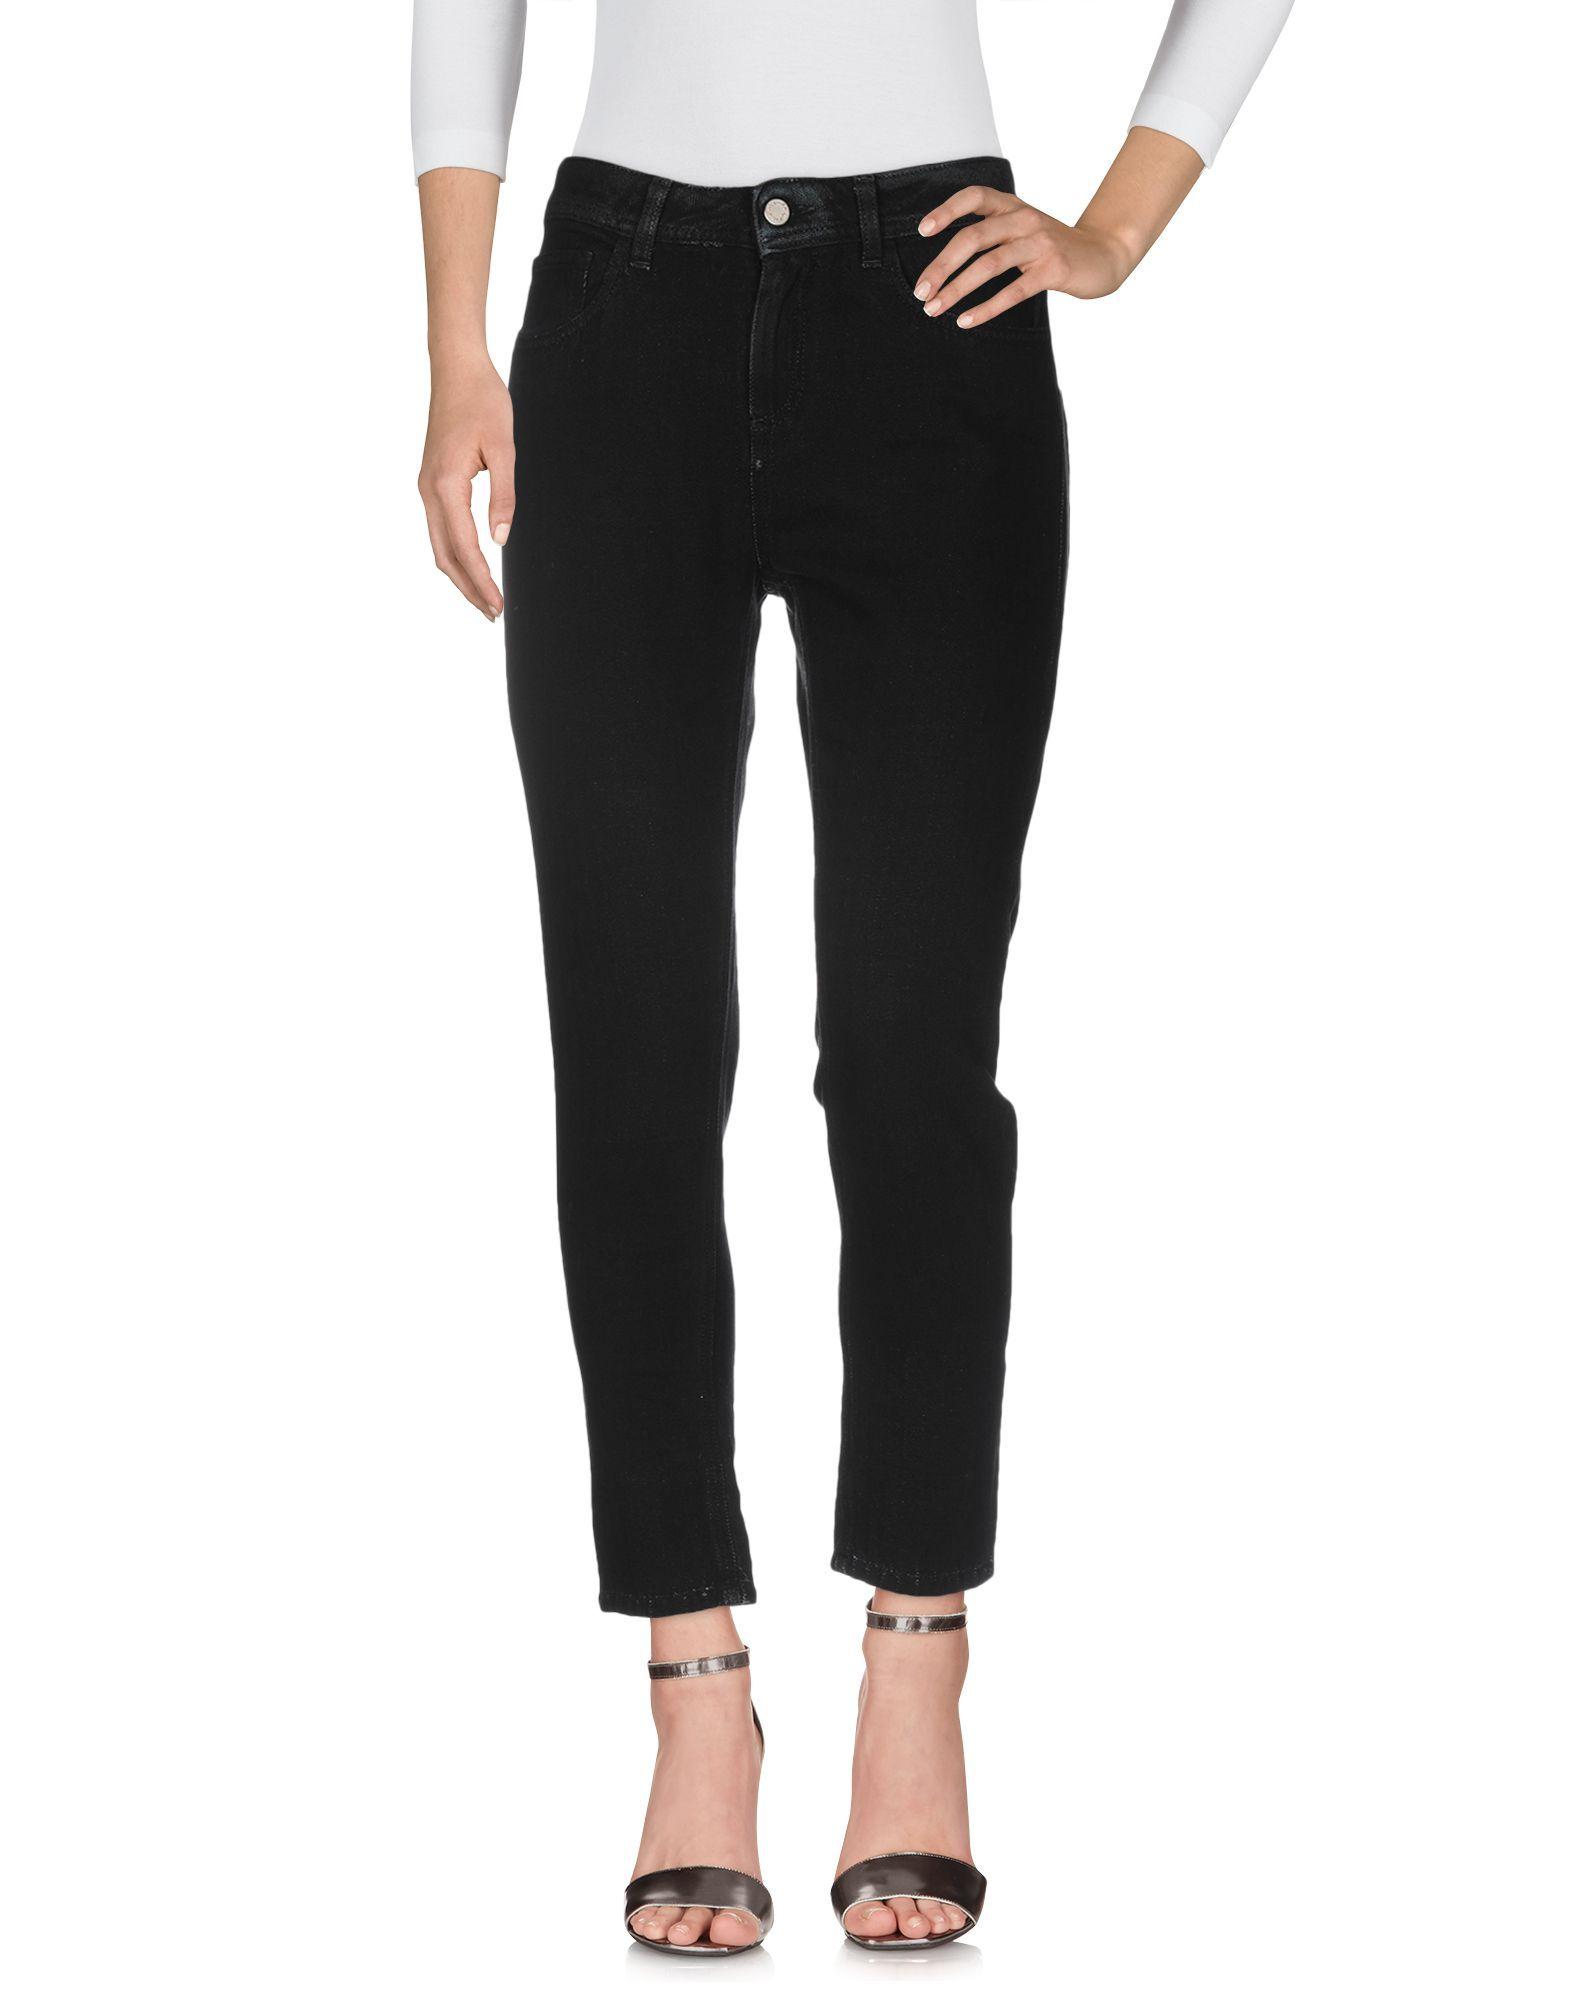 Manila Grace Black Cotton Jeans